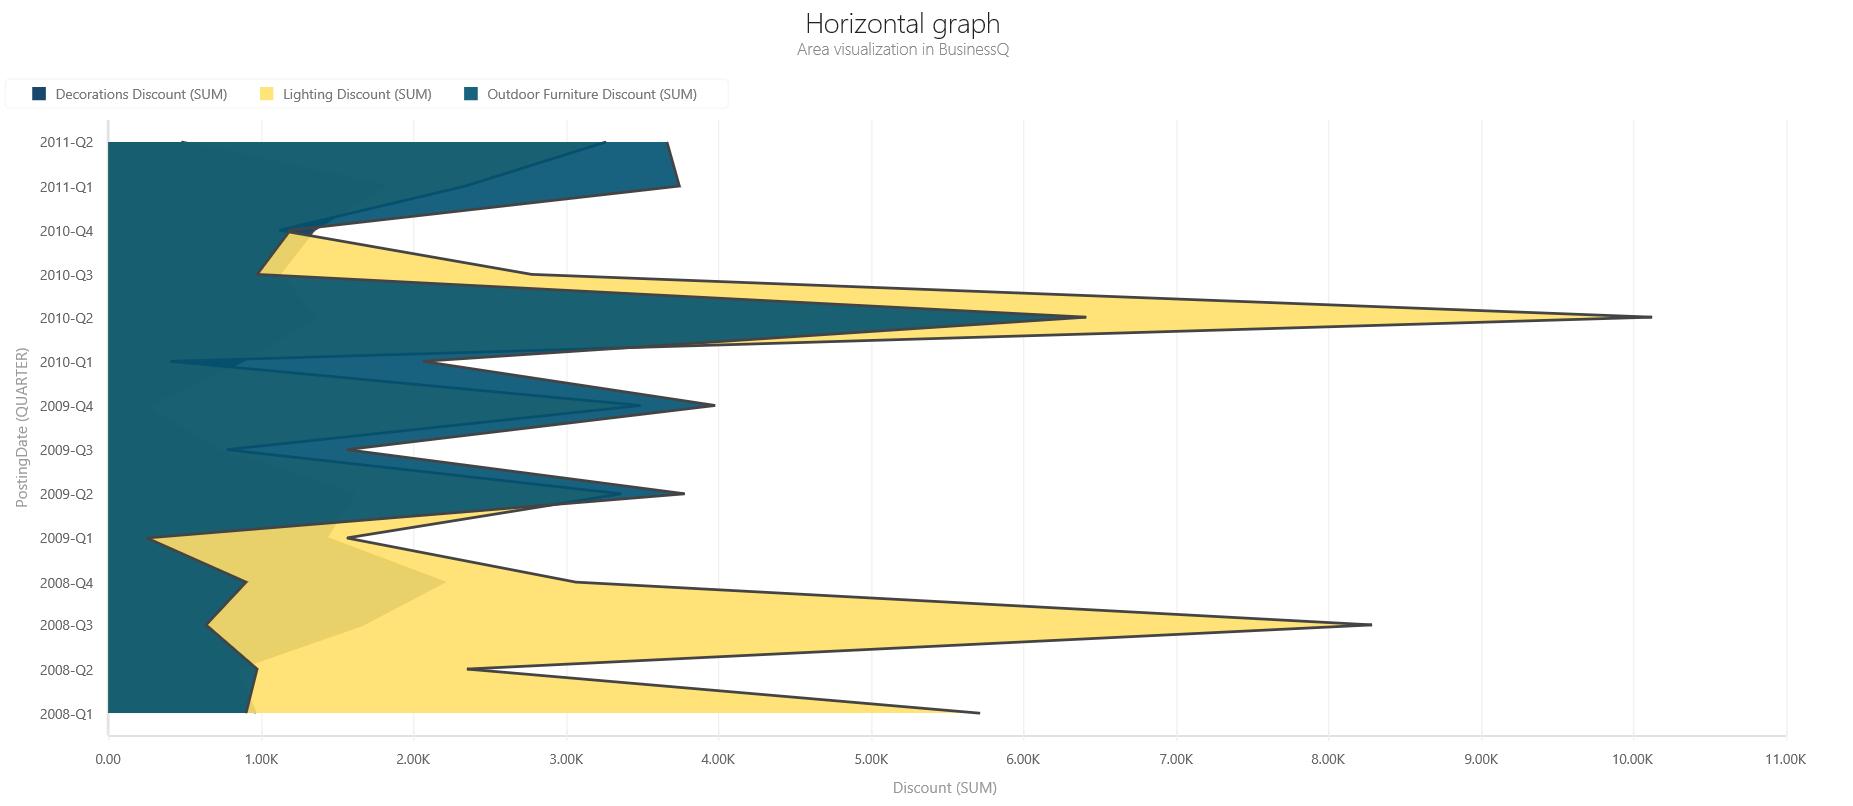 BQ_Horizontal_graph_1_Horizontal_Area